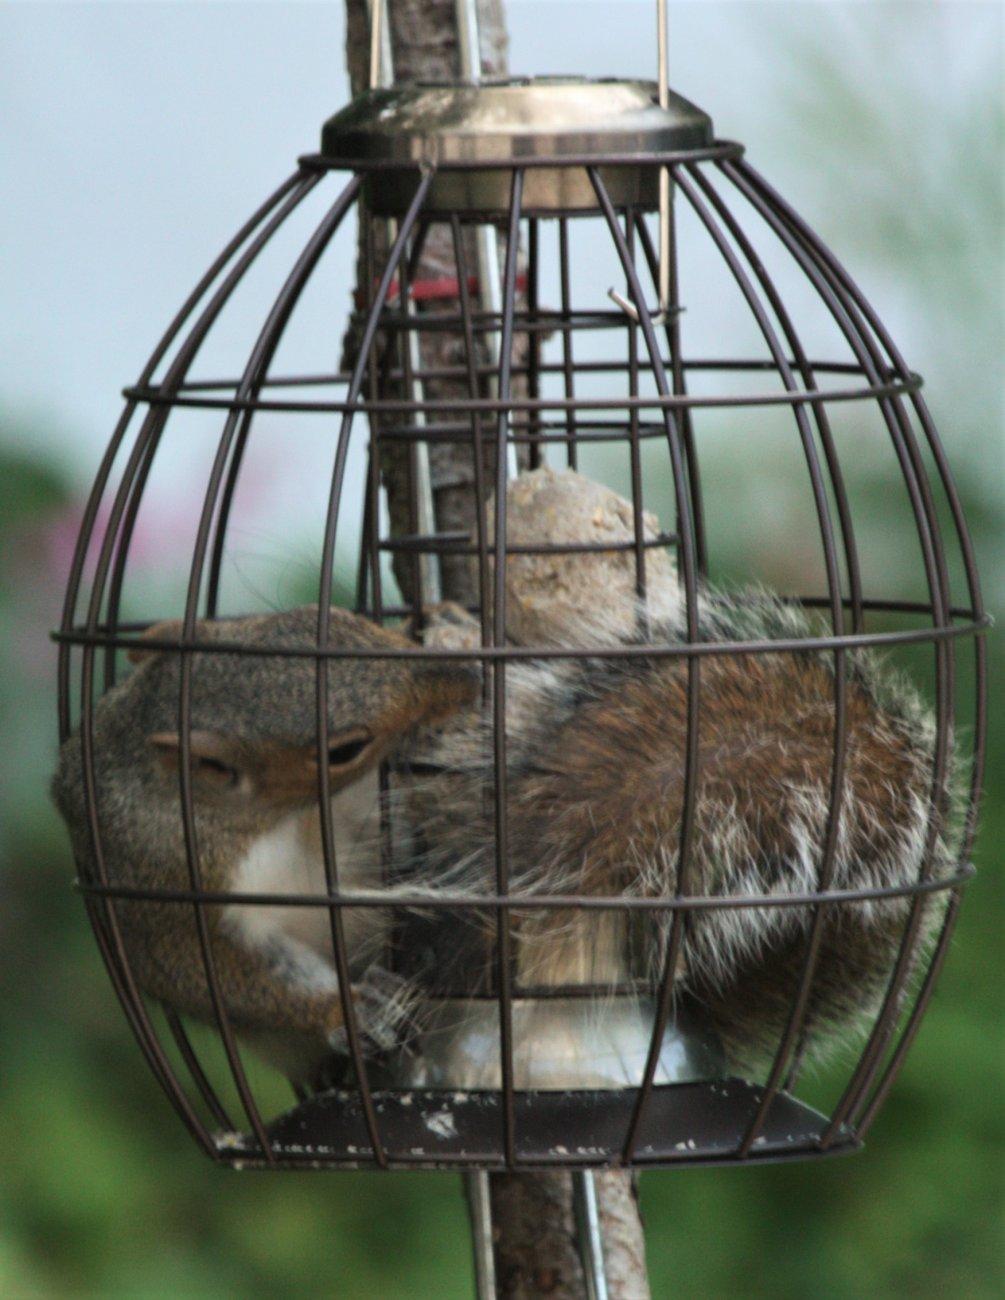 Squirrel proof feeder?